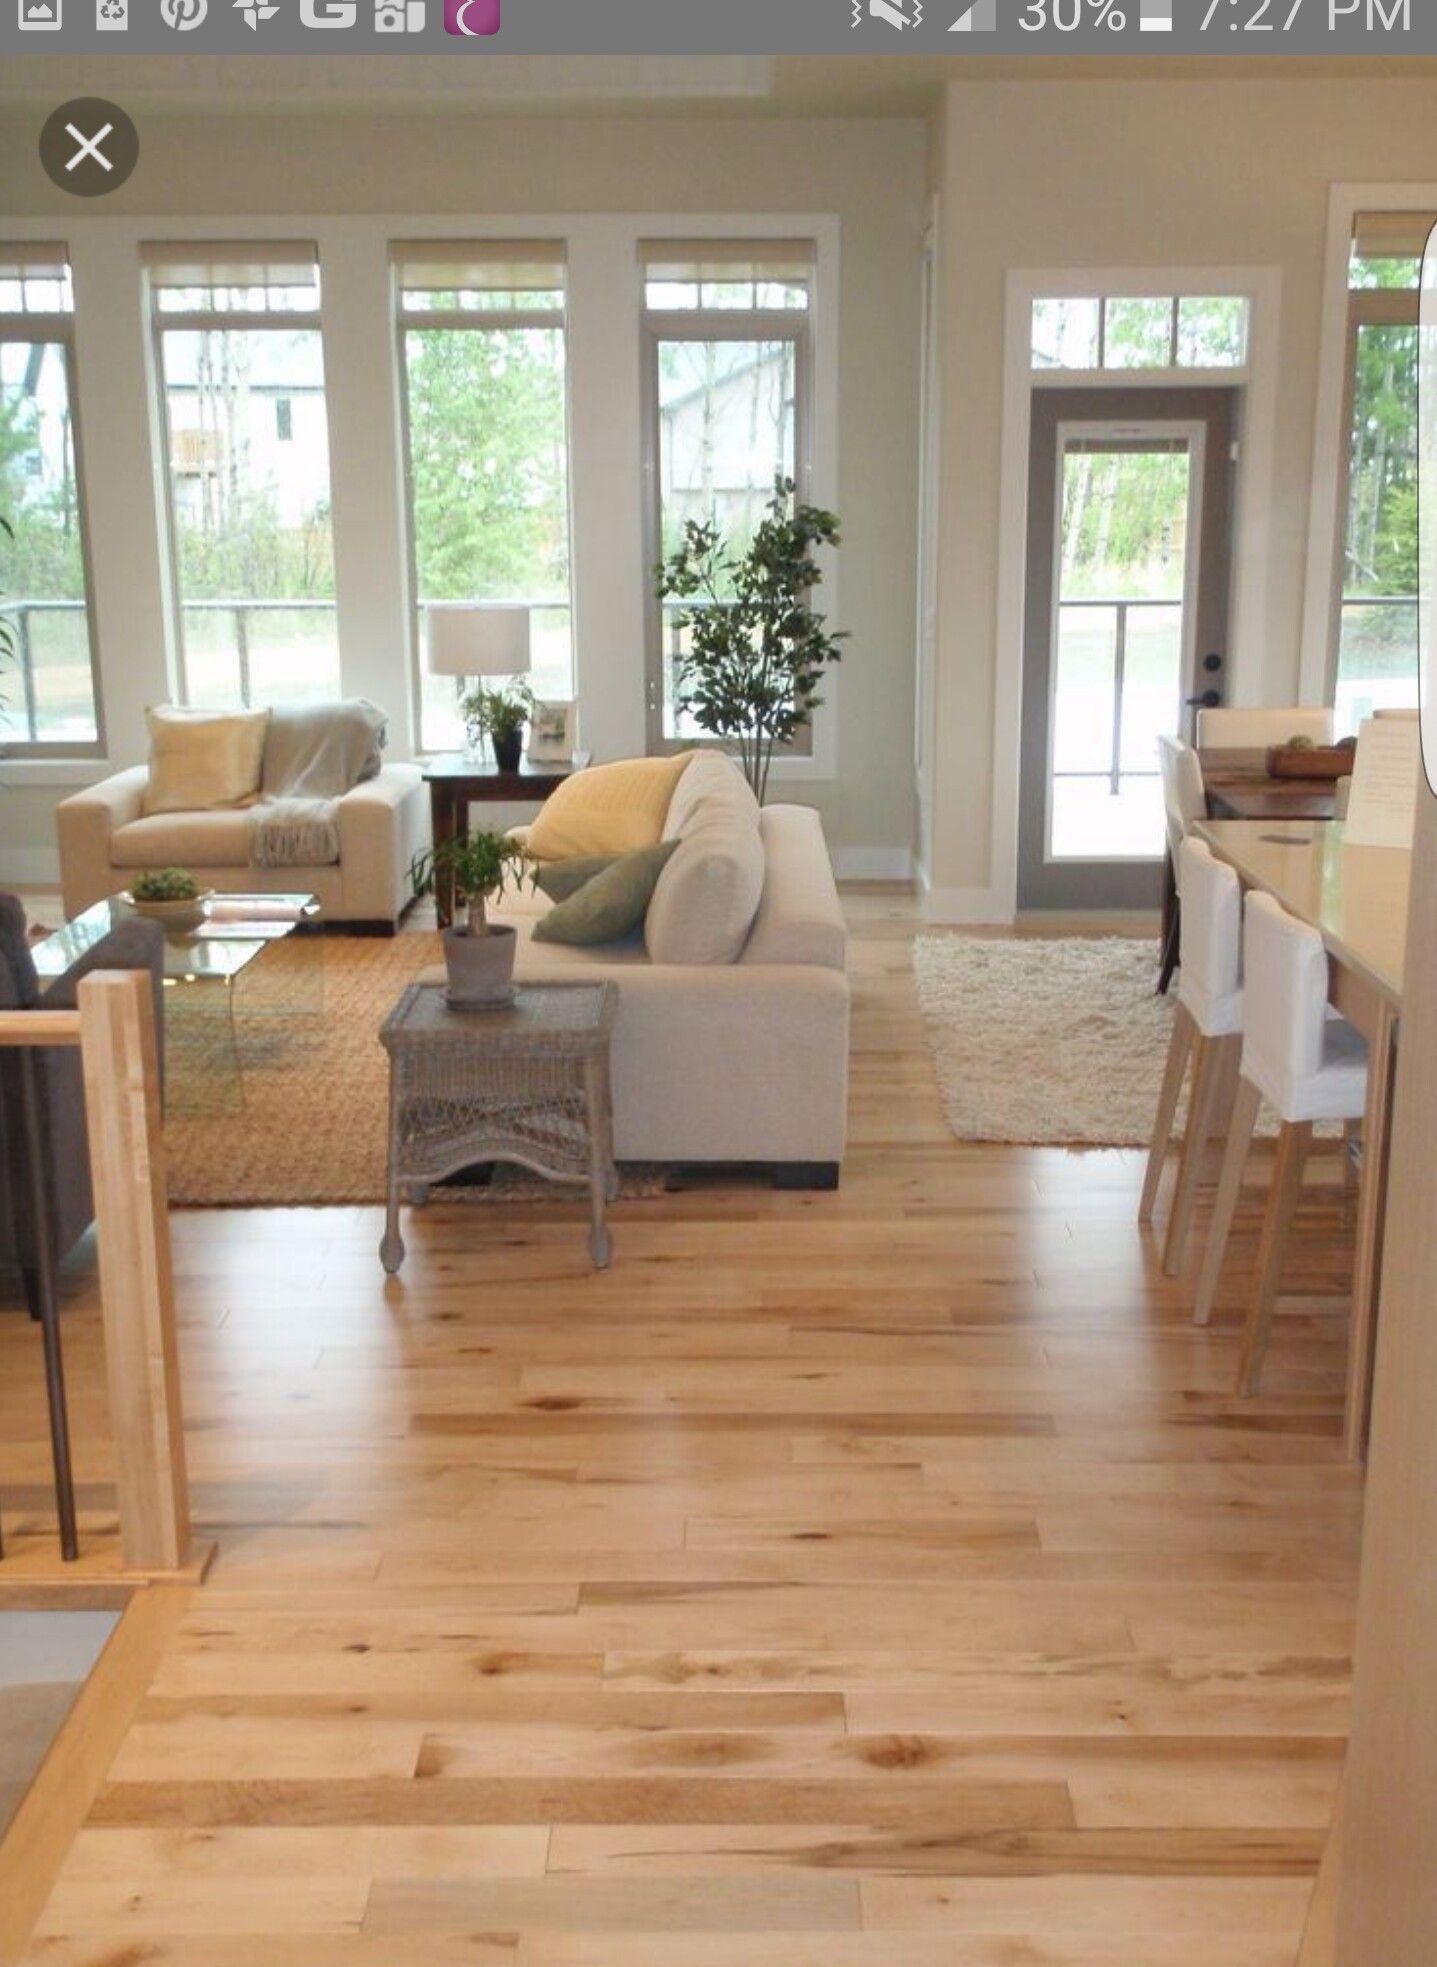 Family Room Wood Flooring Options Living Room Wood Floor Floor Design Light Wood Floors